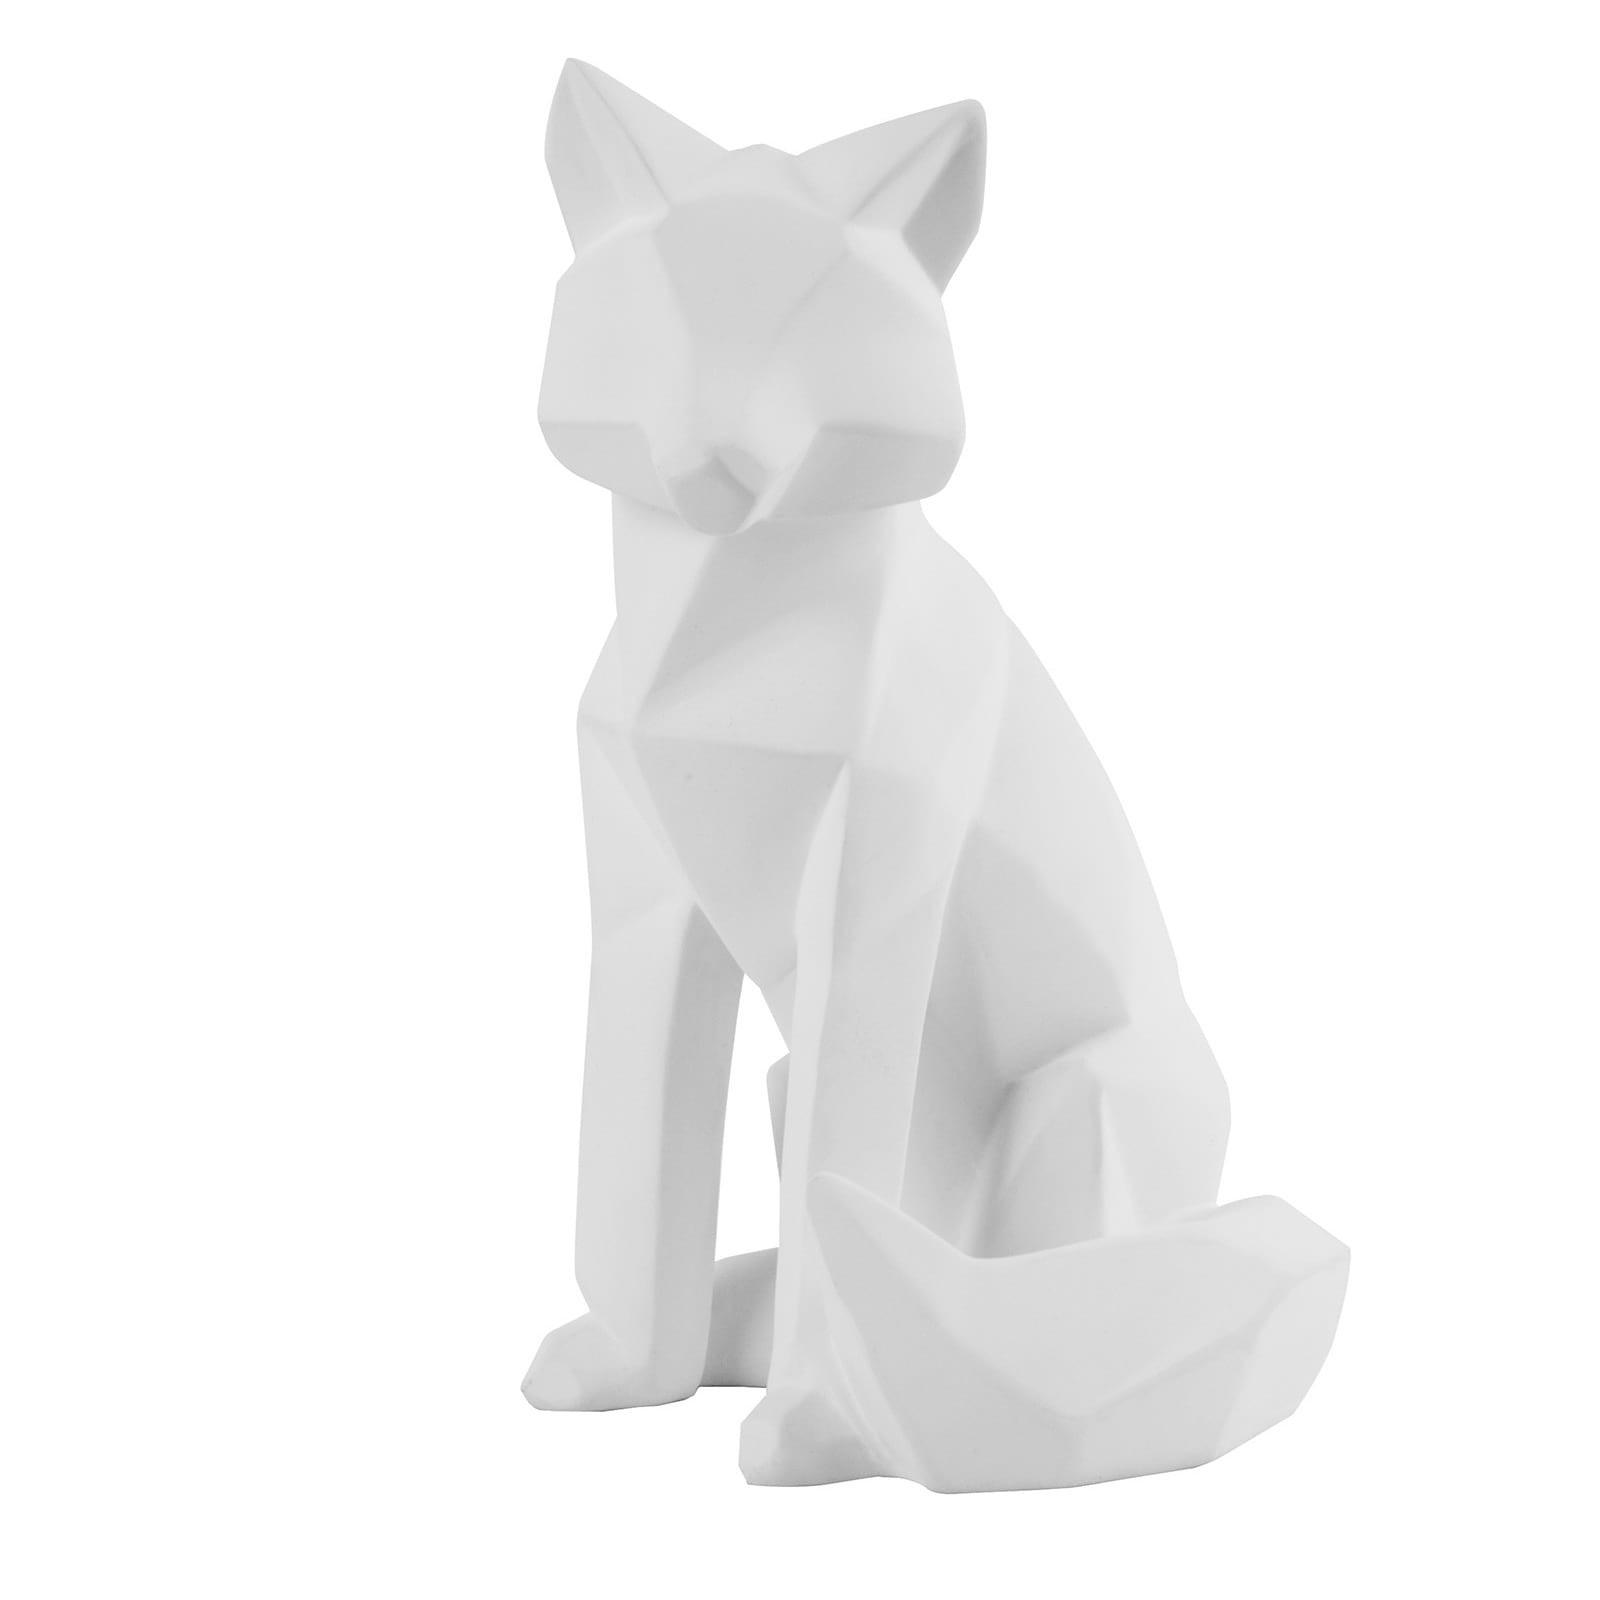 Origami Fox Statue Large (Matt White) - Present Time